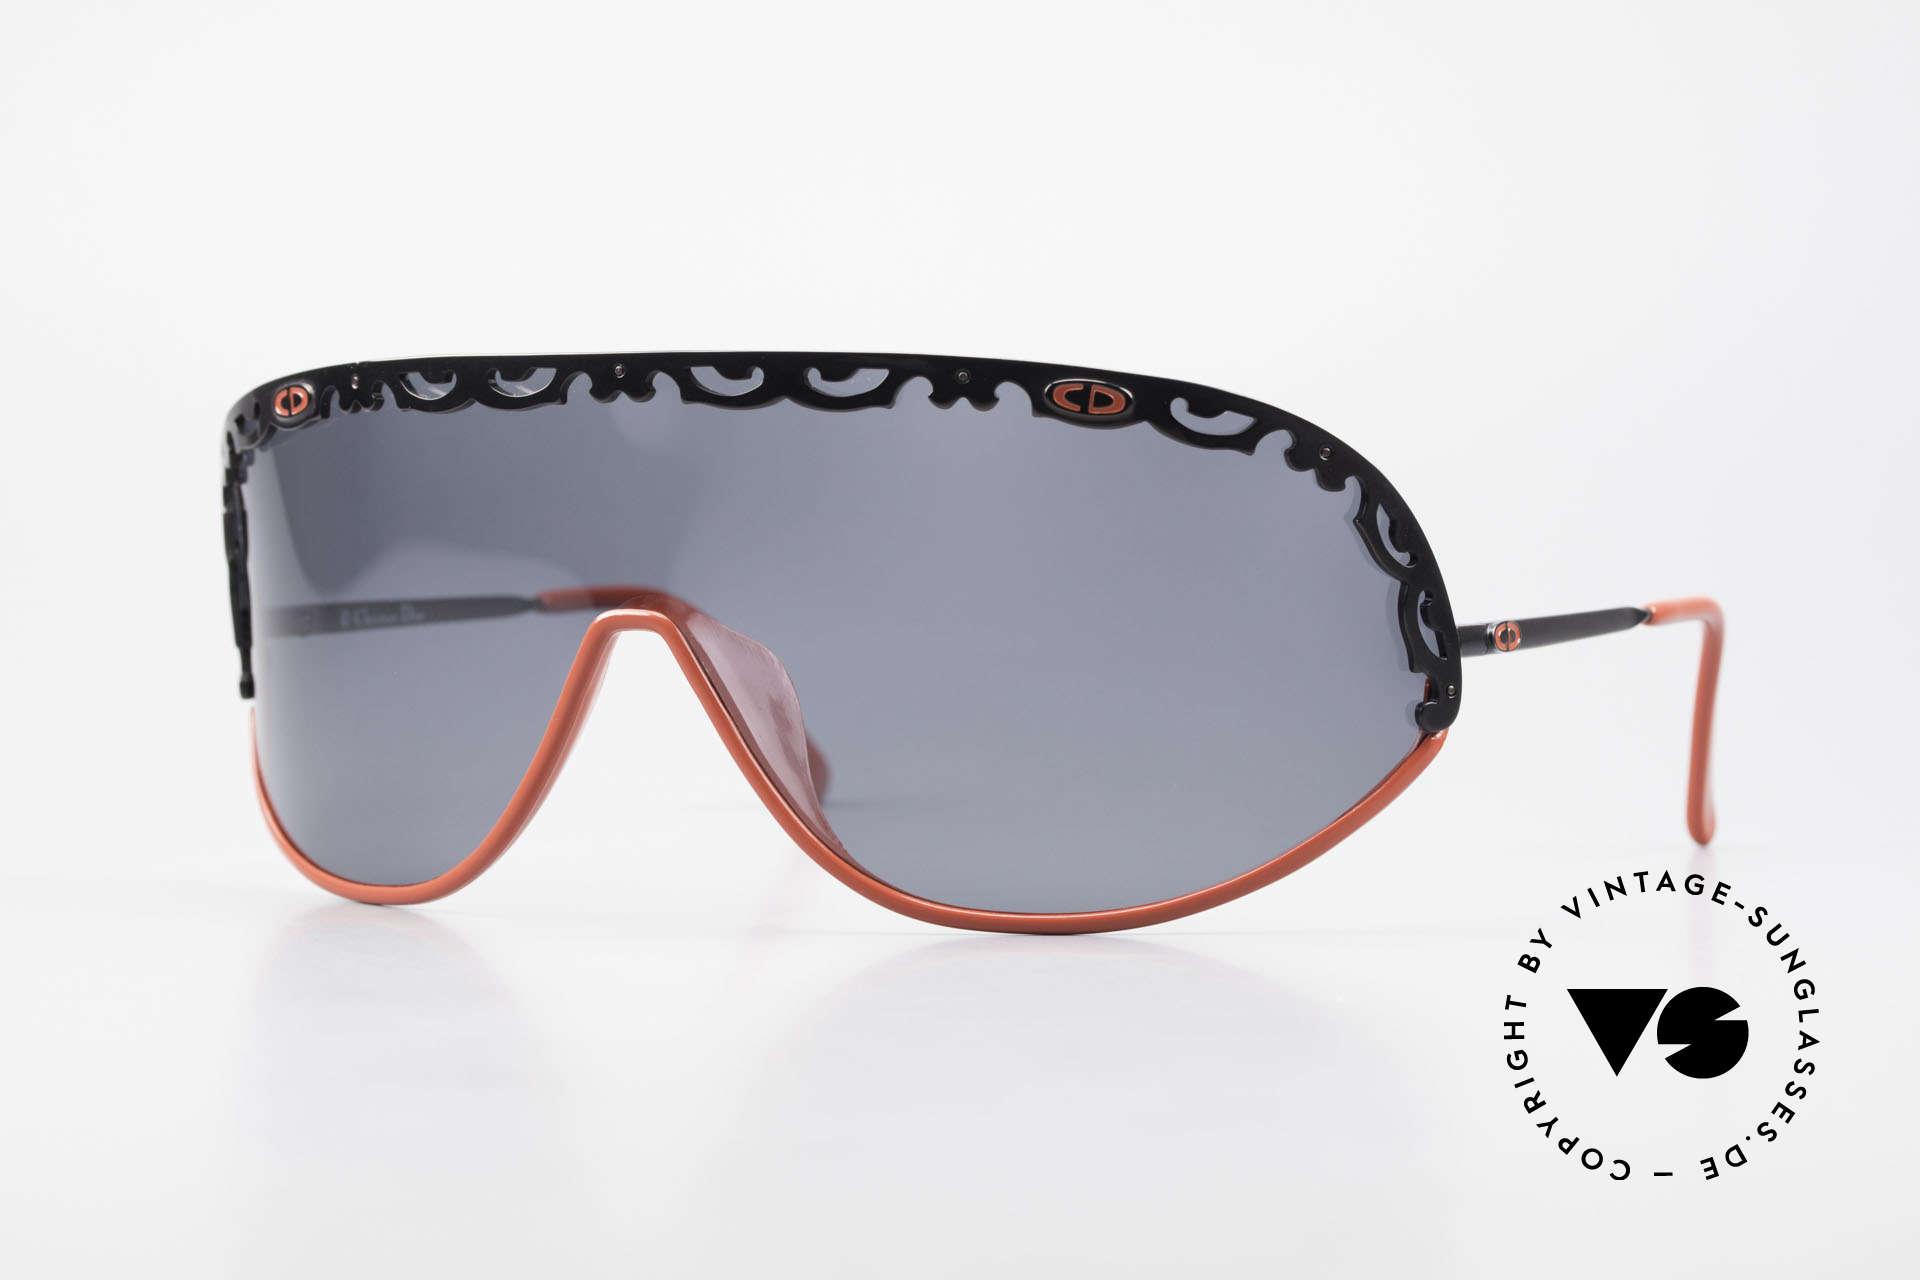 Christian Dior 2501 Polarized Sunglasses 80's 90's, orig. Christian Dior designer sunglasses from 1989/1990, Made for Women